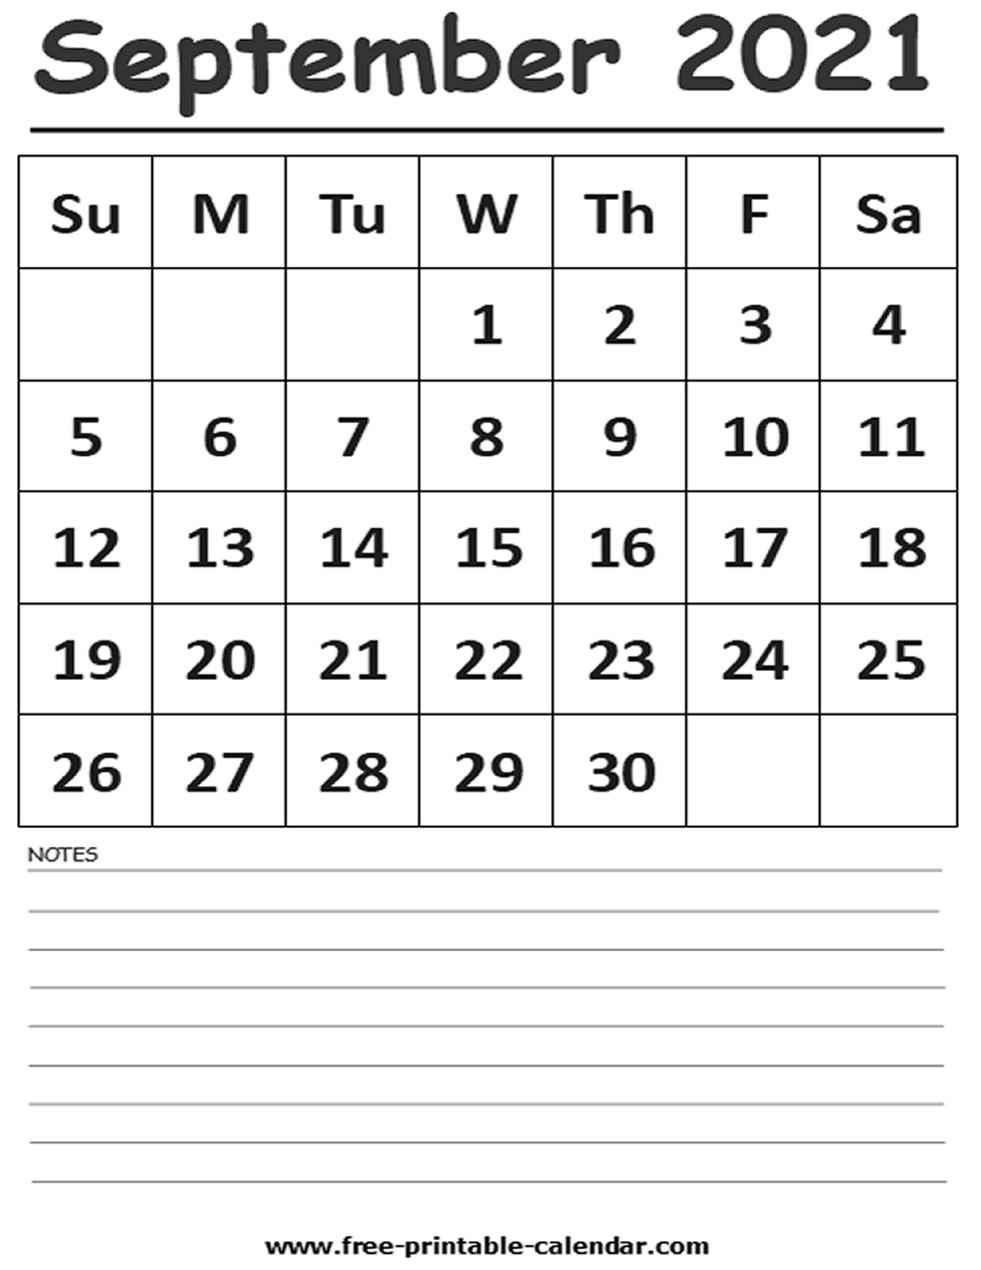 2021 Calendar September Printable - Free-Printable